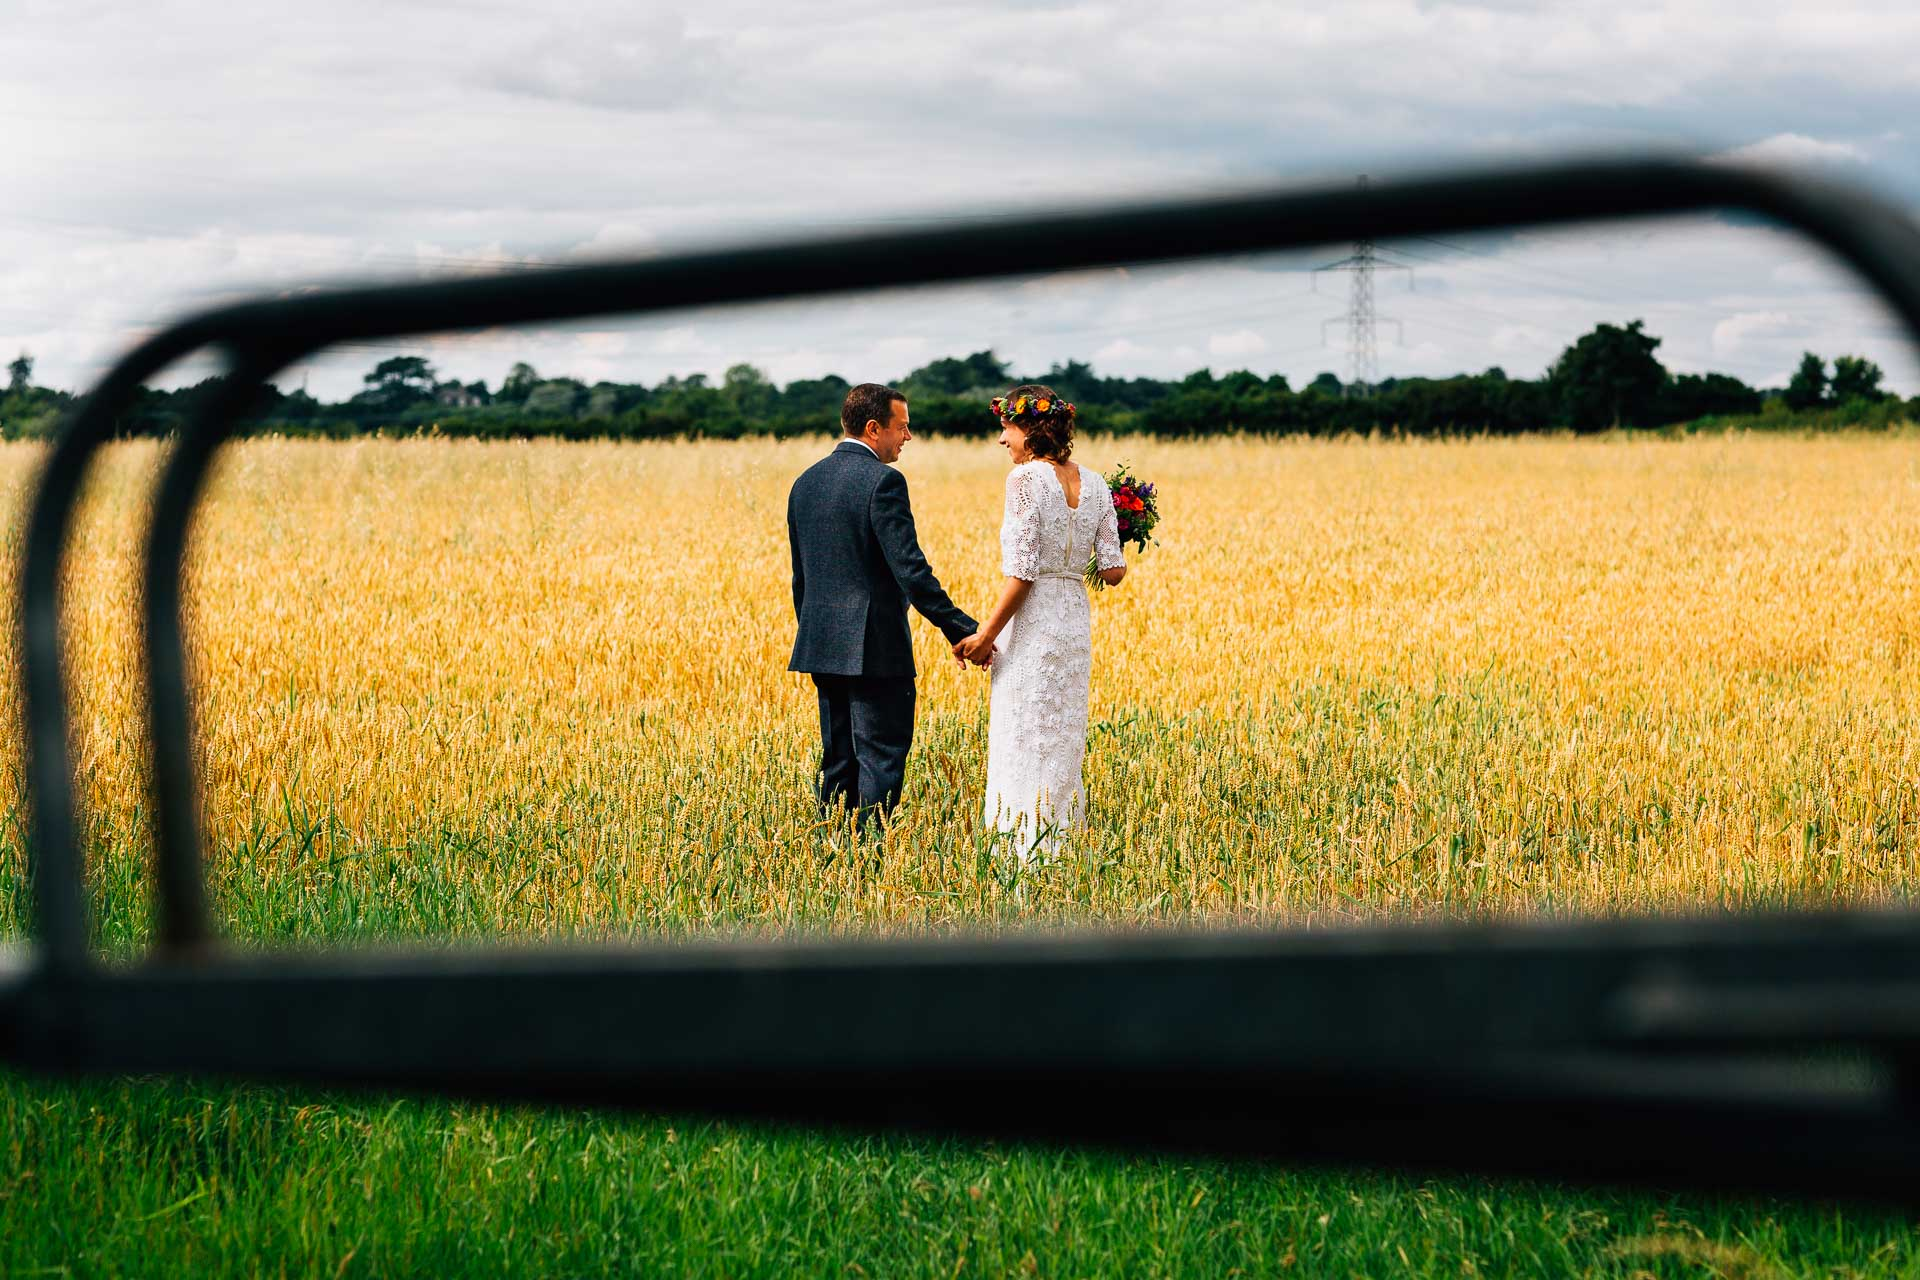 winterbourne-medieval-barn-wedding-photography-emma-andrew-80